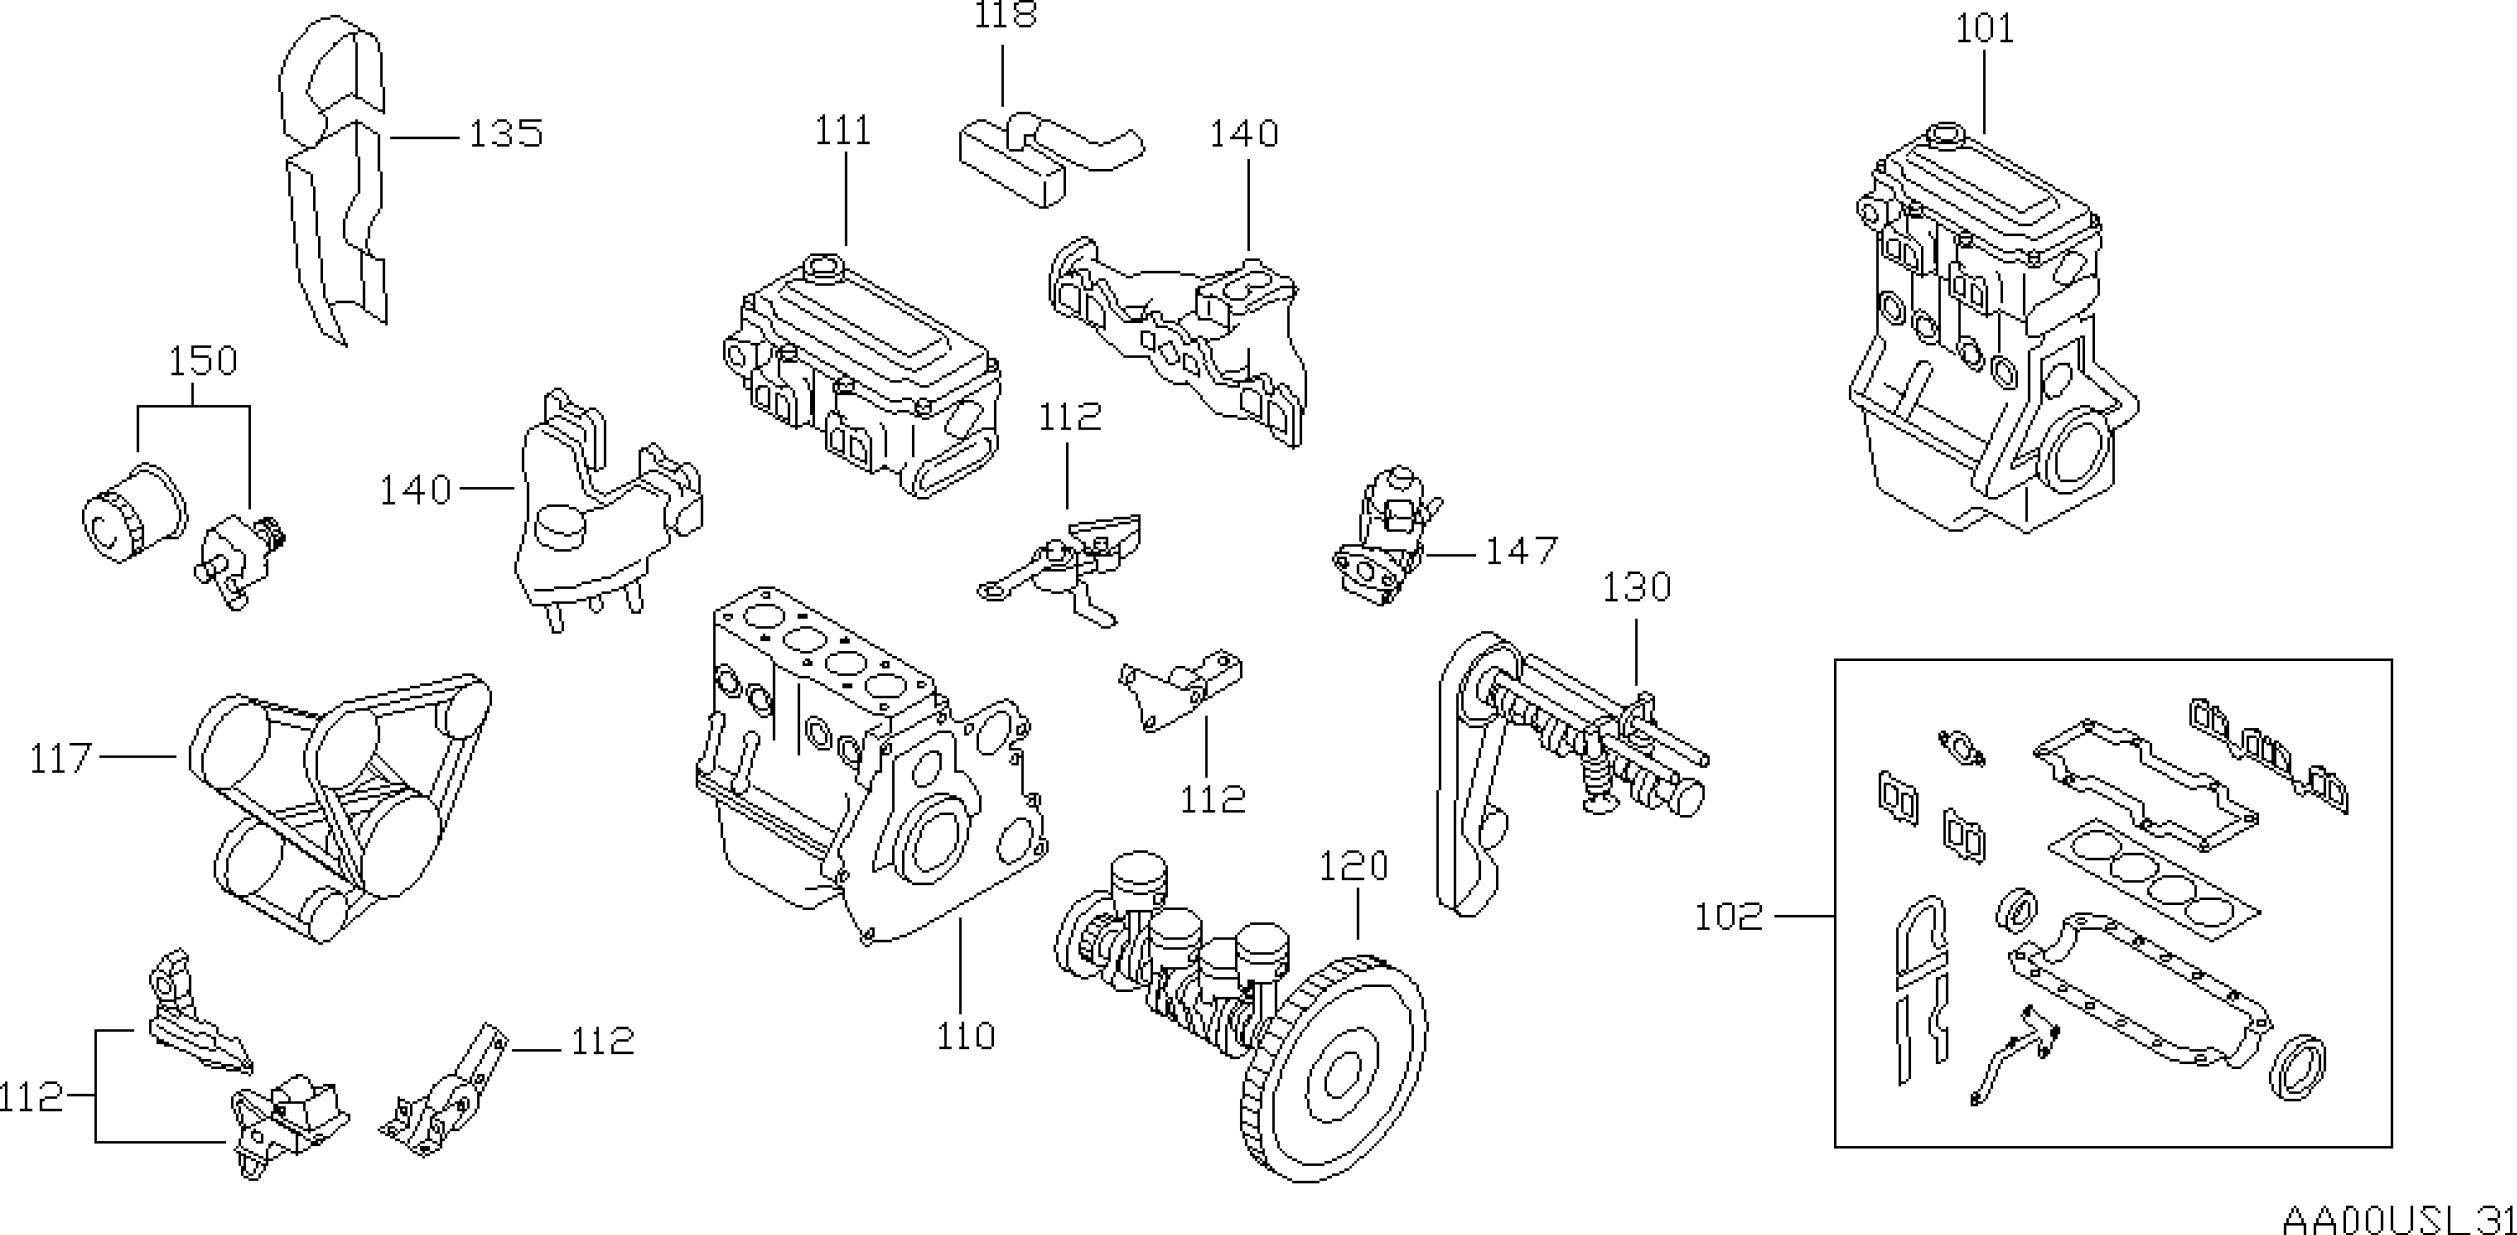 2005 Nissan Altima 2 5 Engine Diagram Car Stereo Wiring